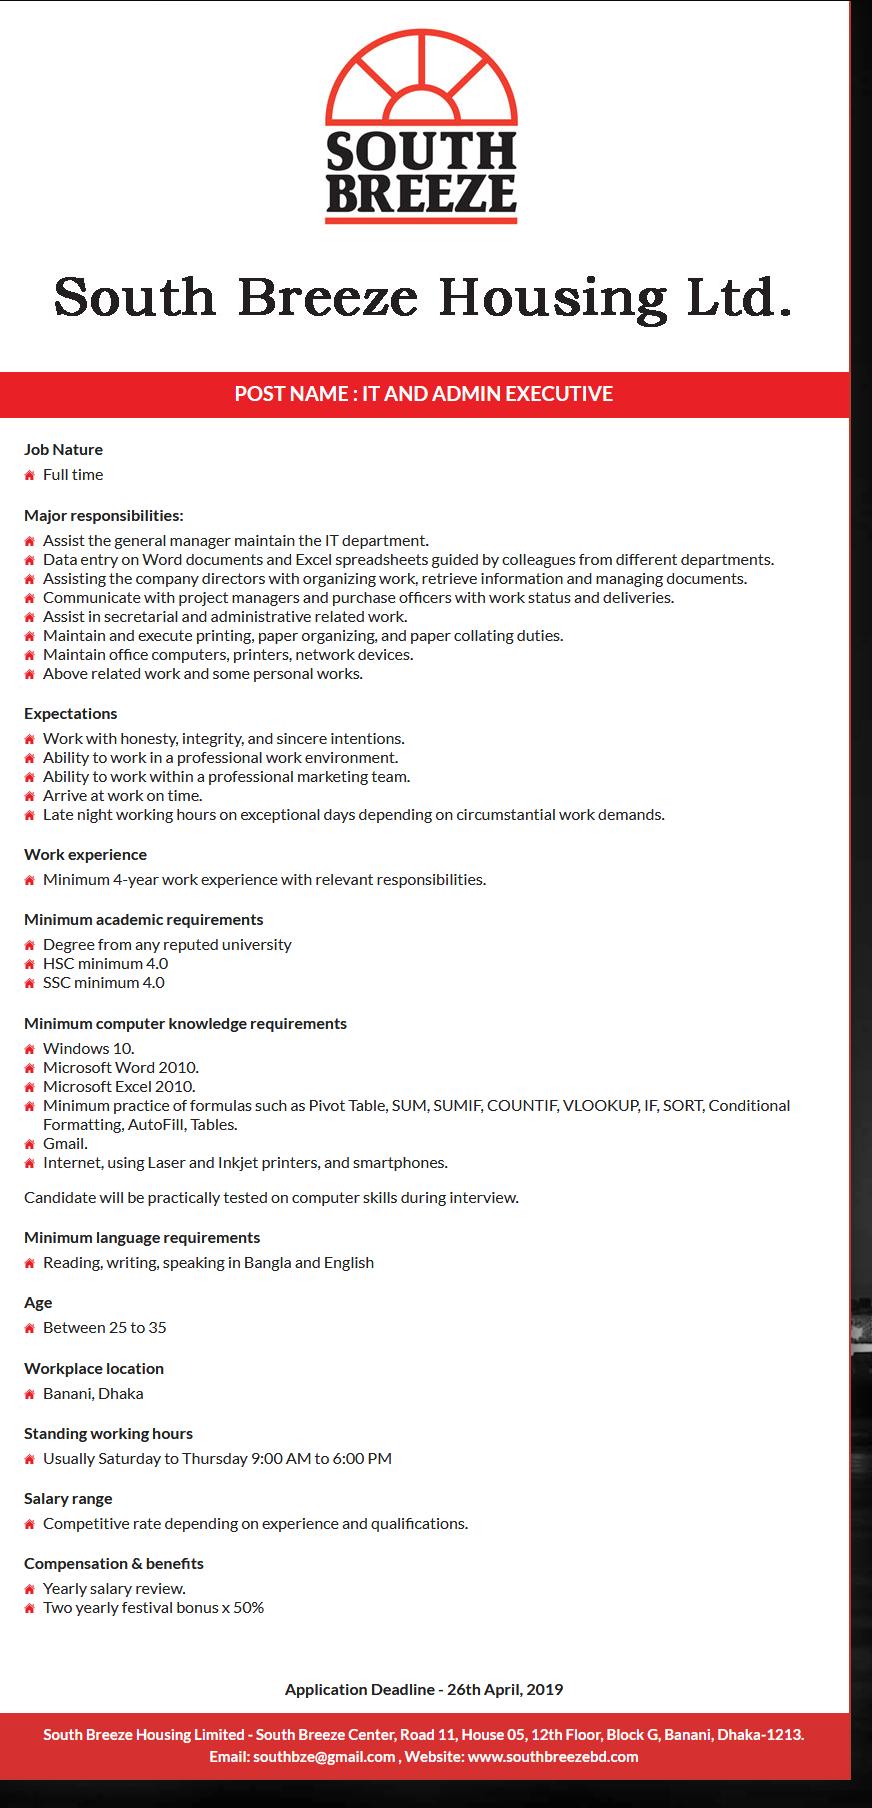 South Breeze Housing Ltd Job Circular 2019